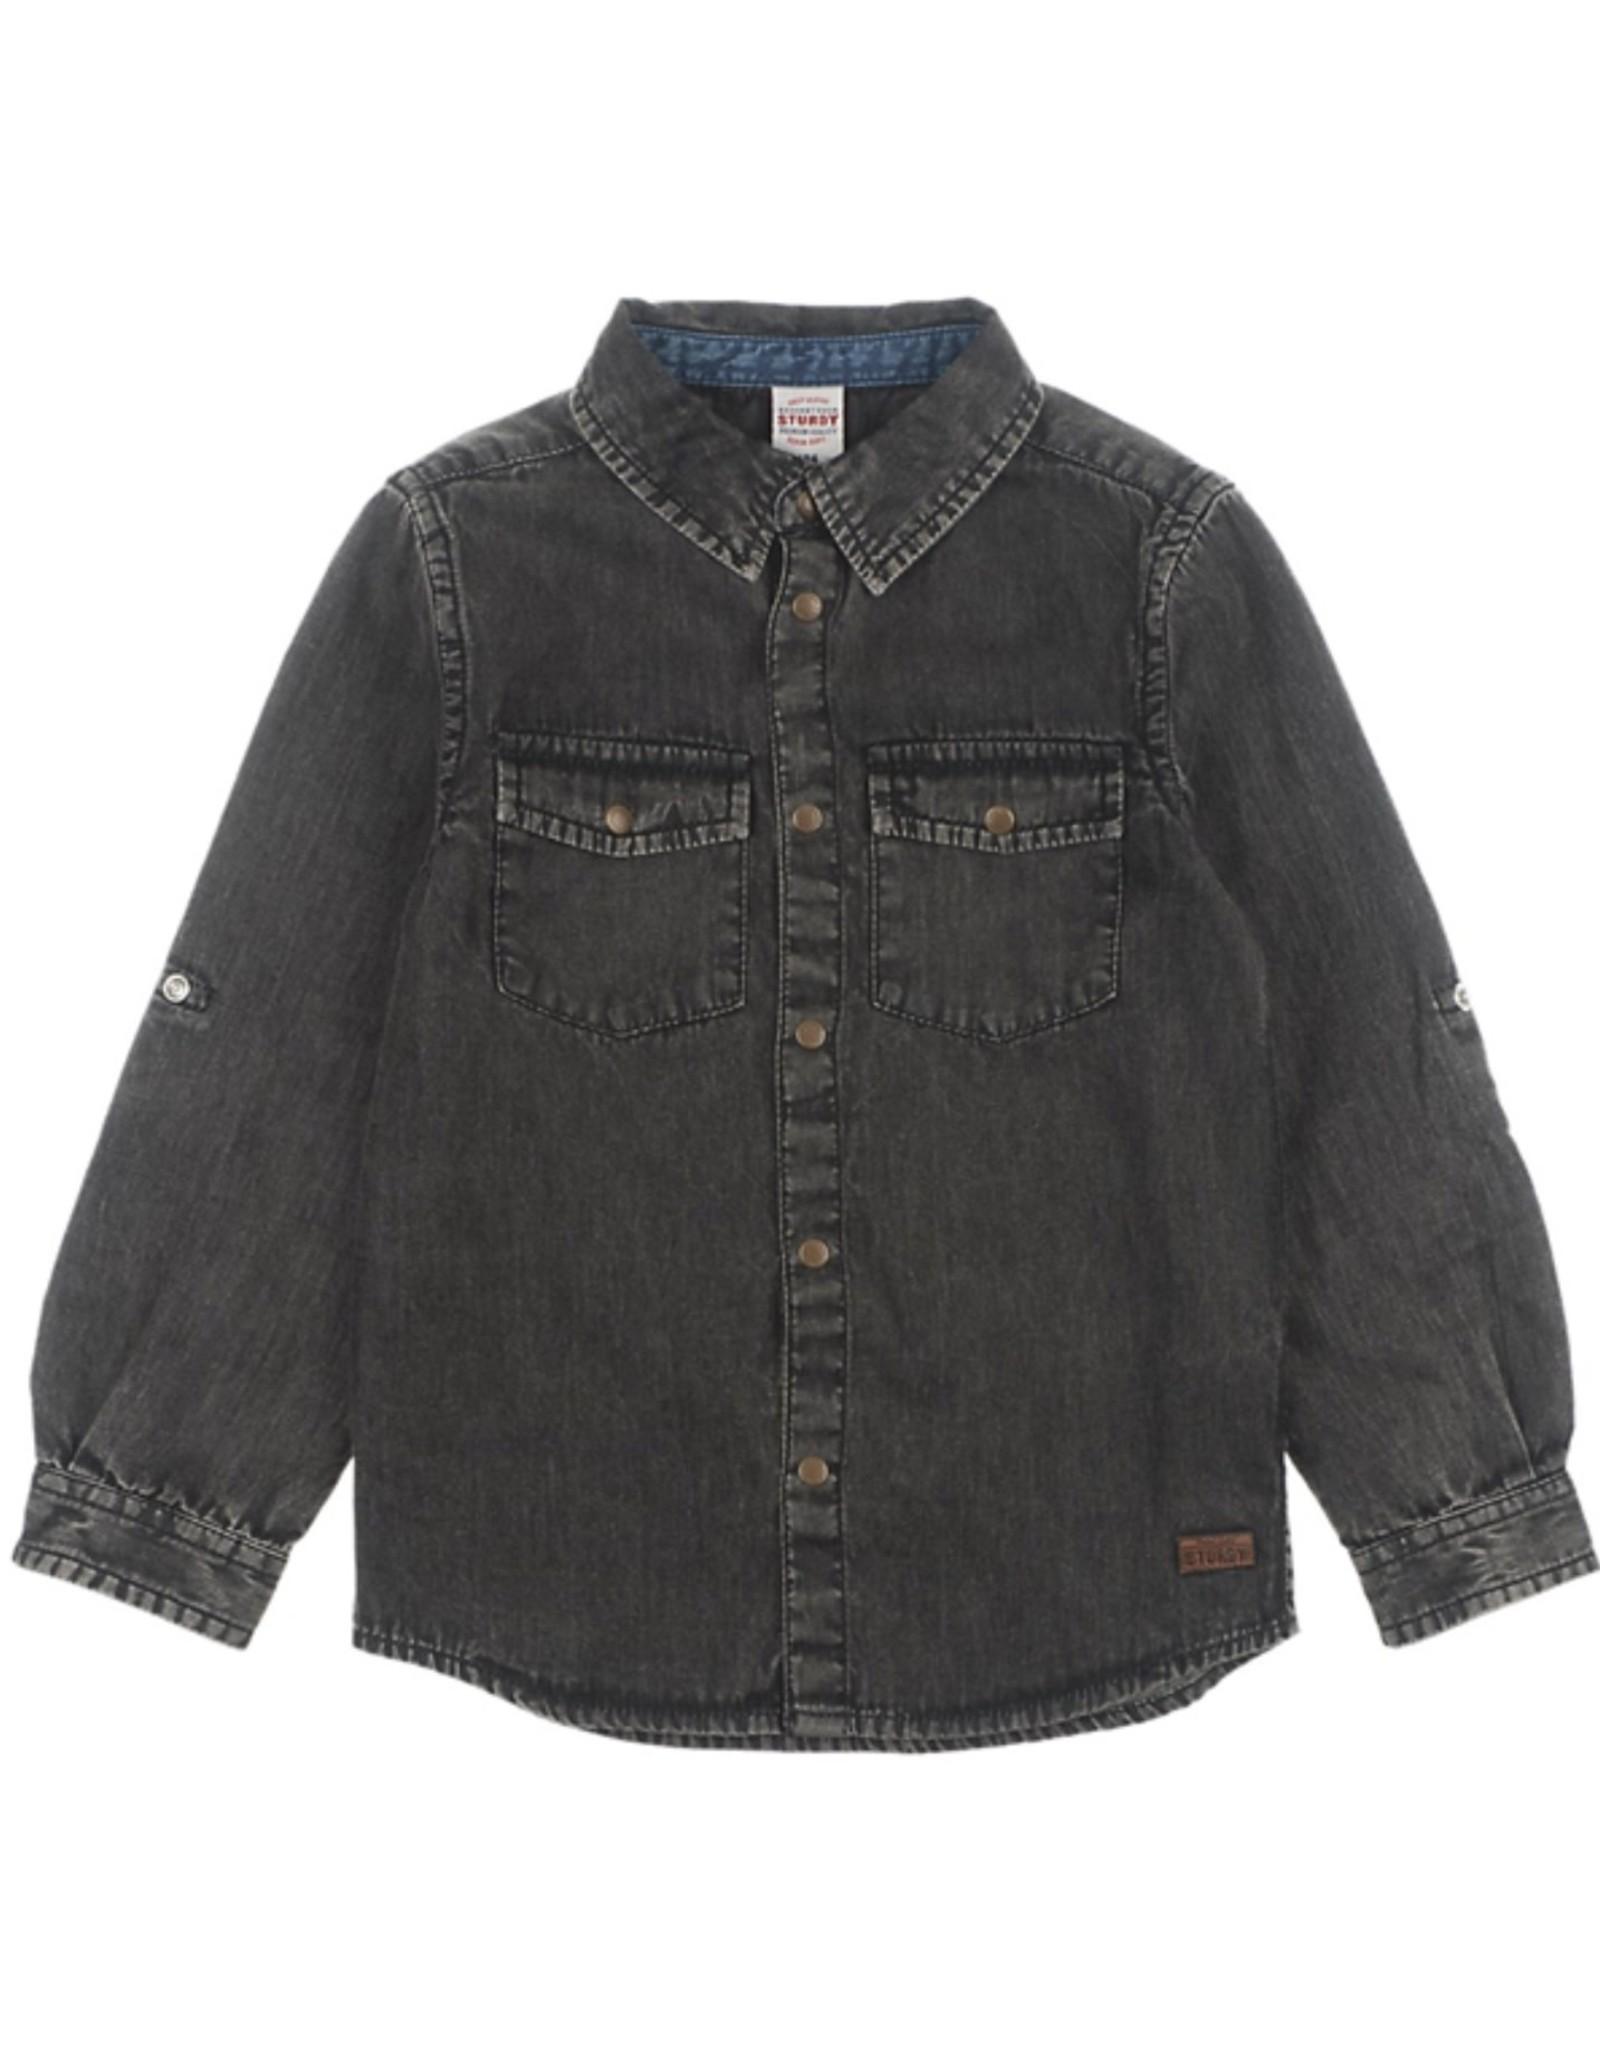 Sturdy 723.00041 blouse